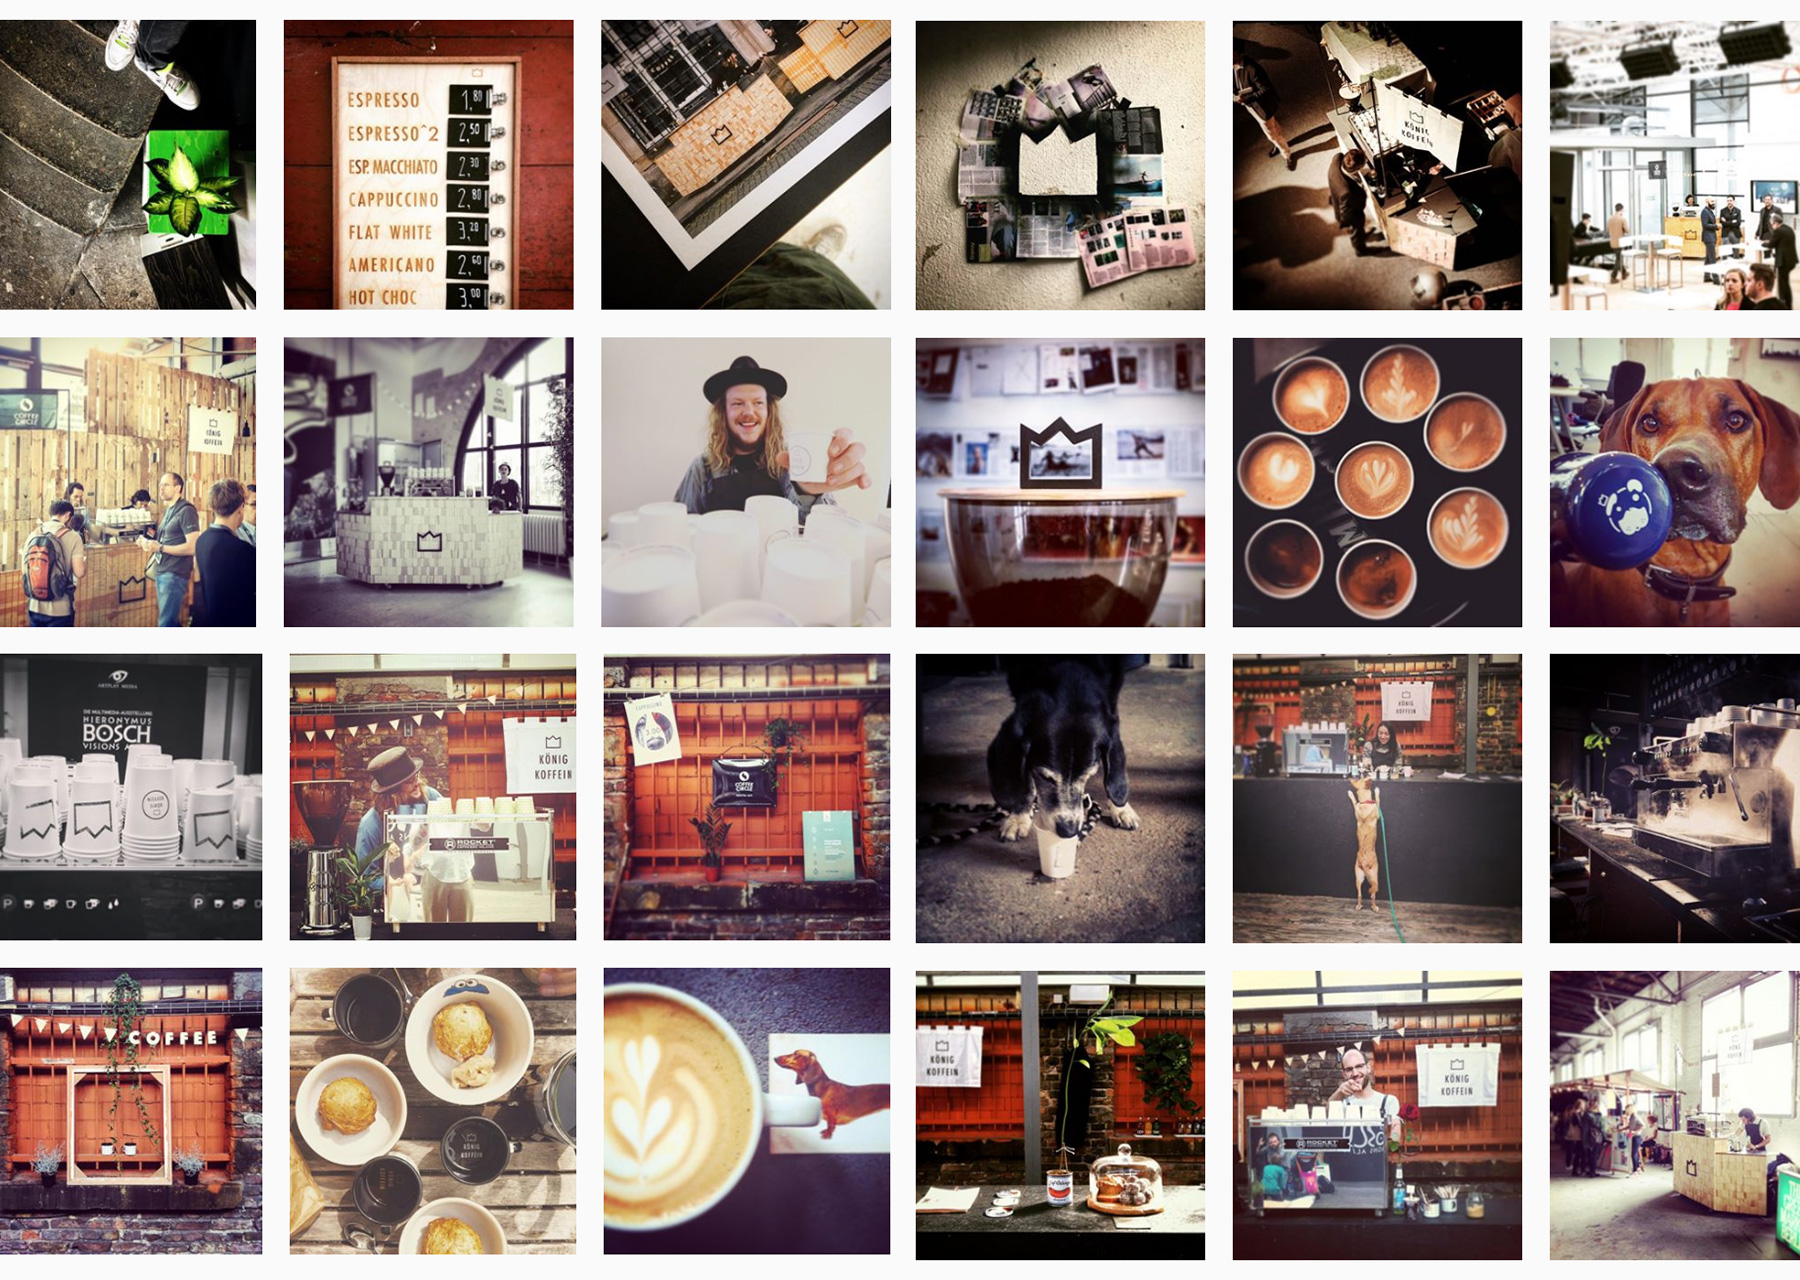 koenig_koffein_kaffee_catering_instagram-gr